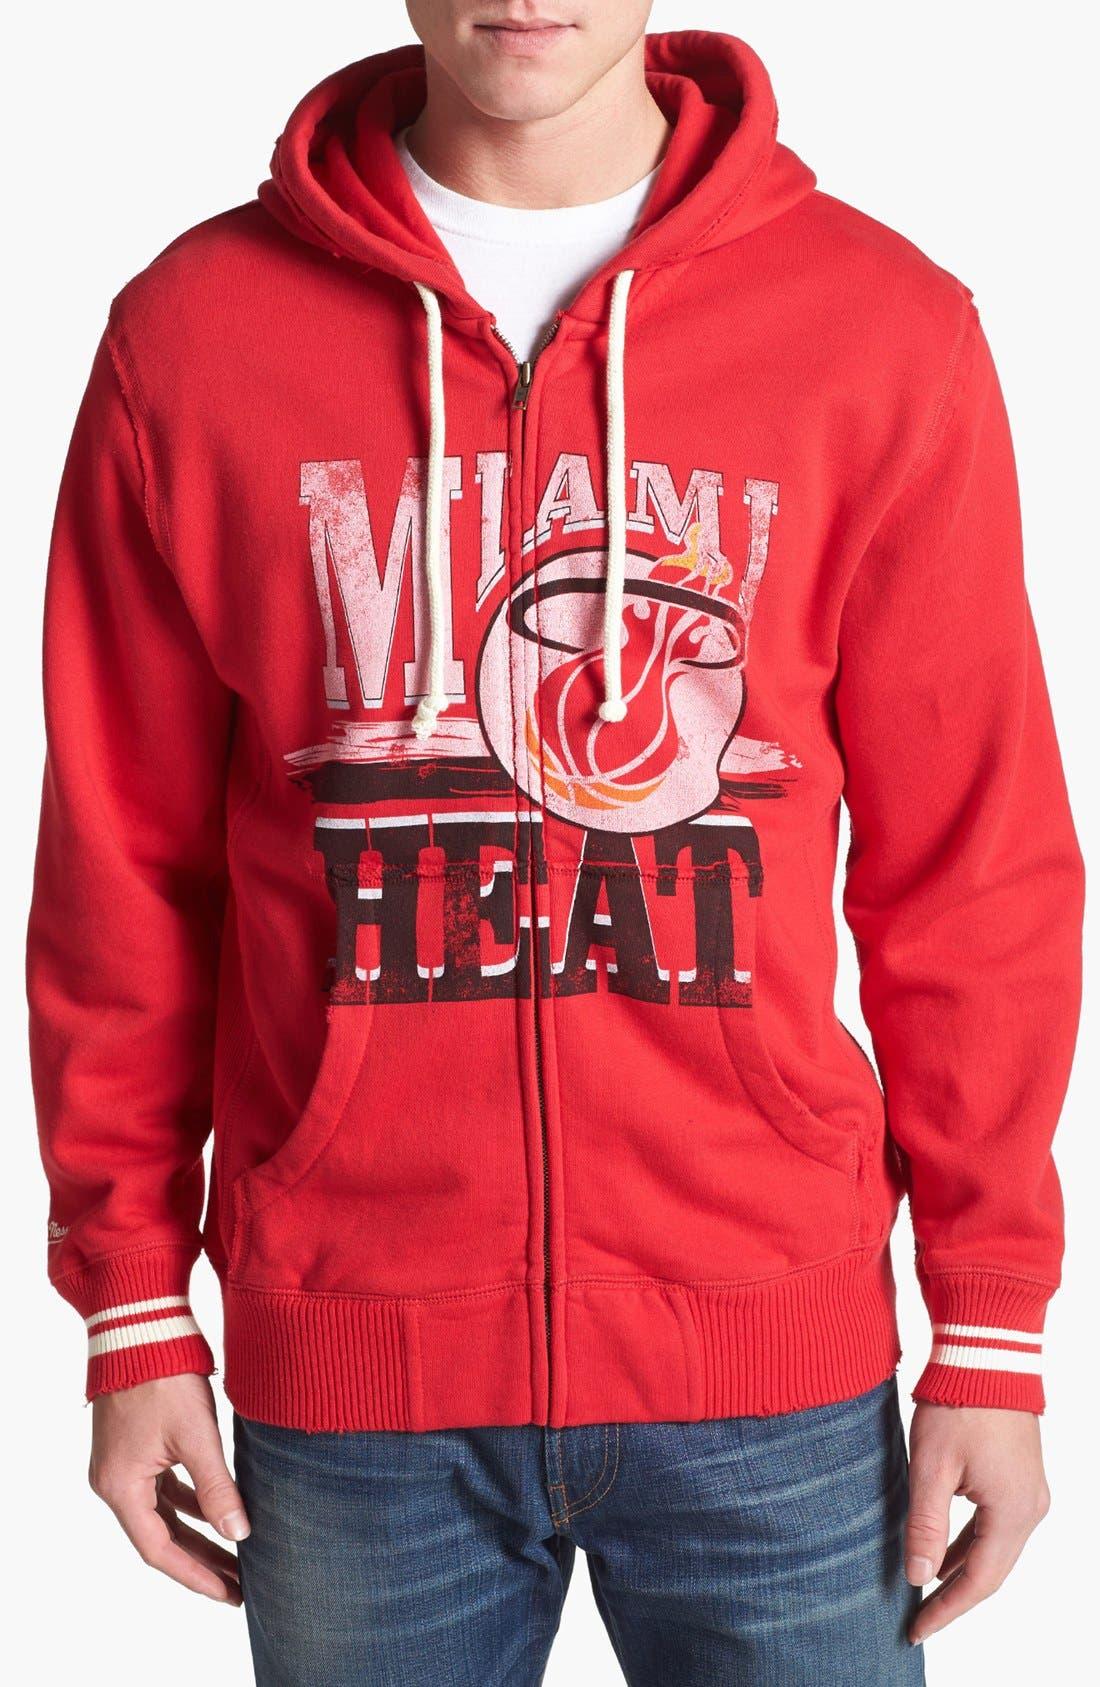 Alternate Image 1 Selected - Mitchell & Ness 'Miami Heat' Hoodie